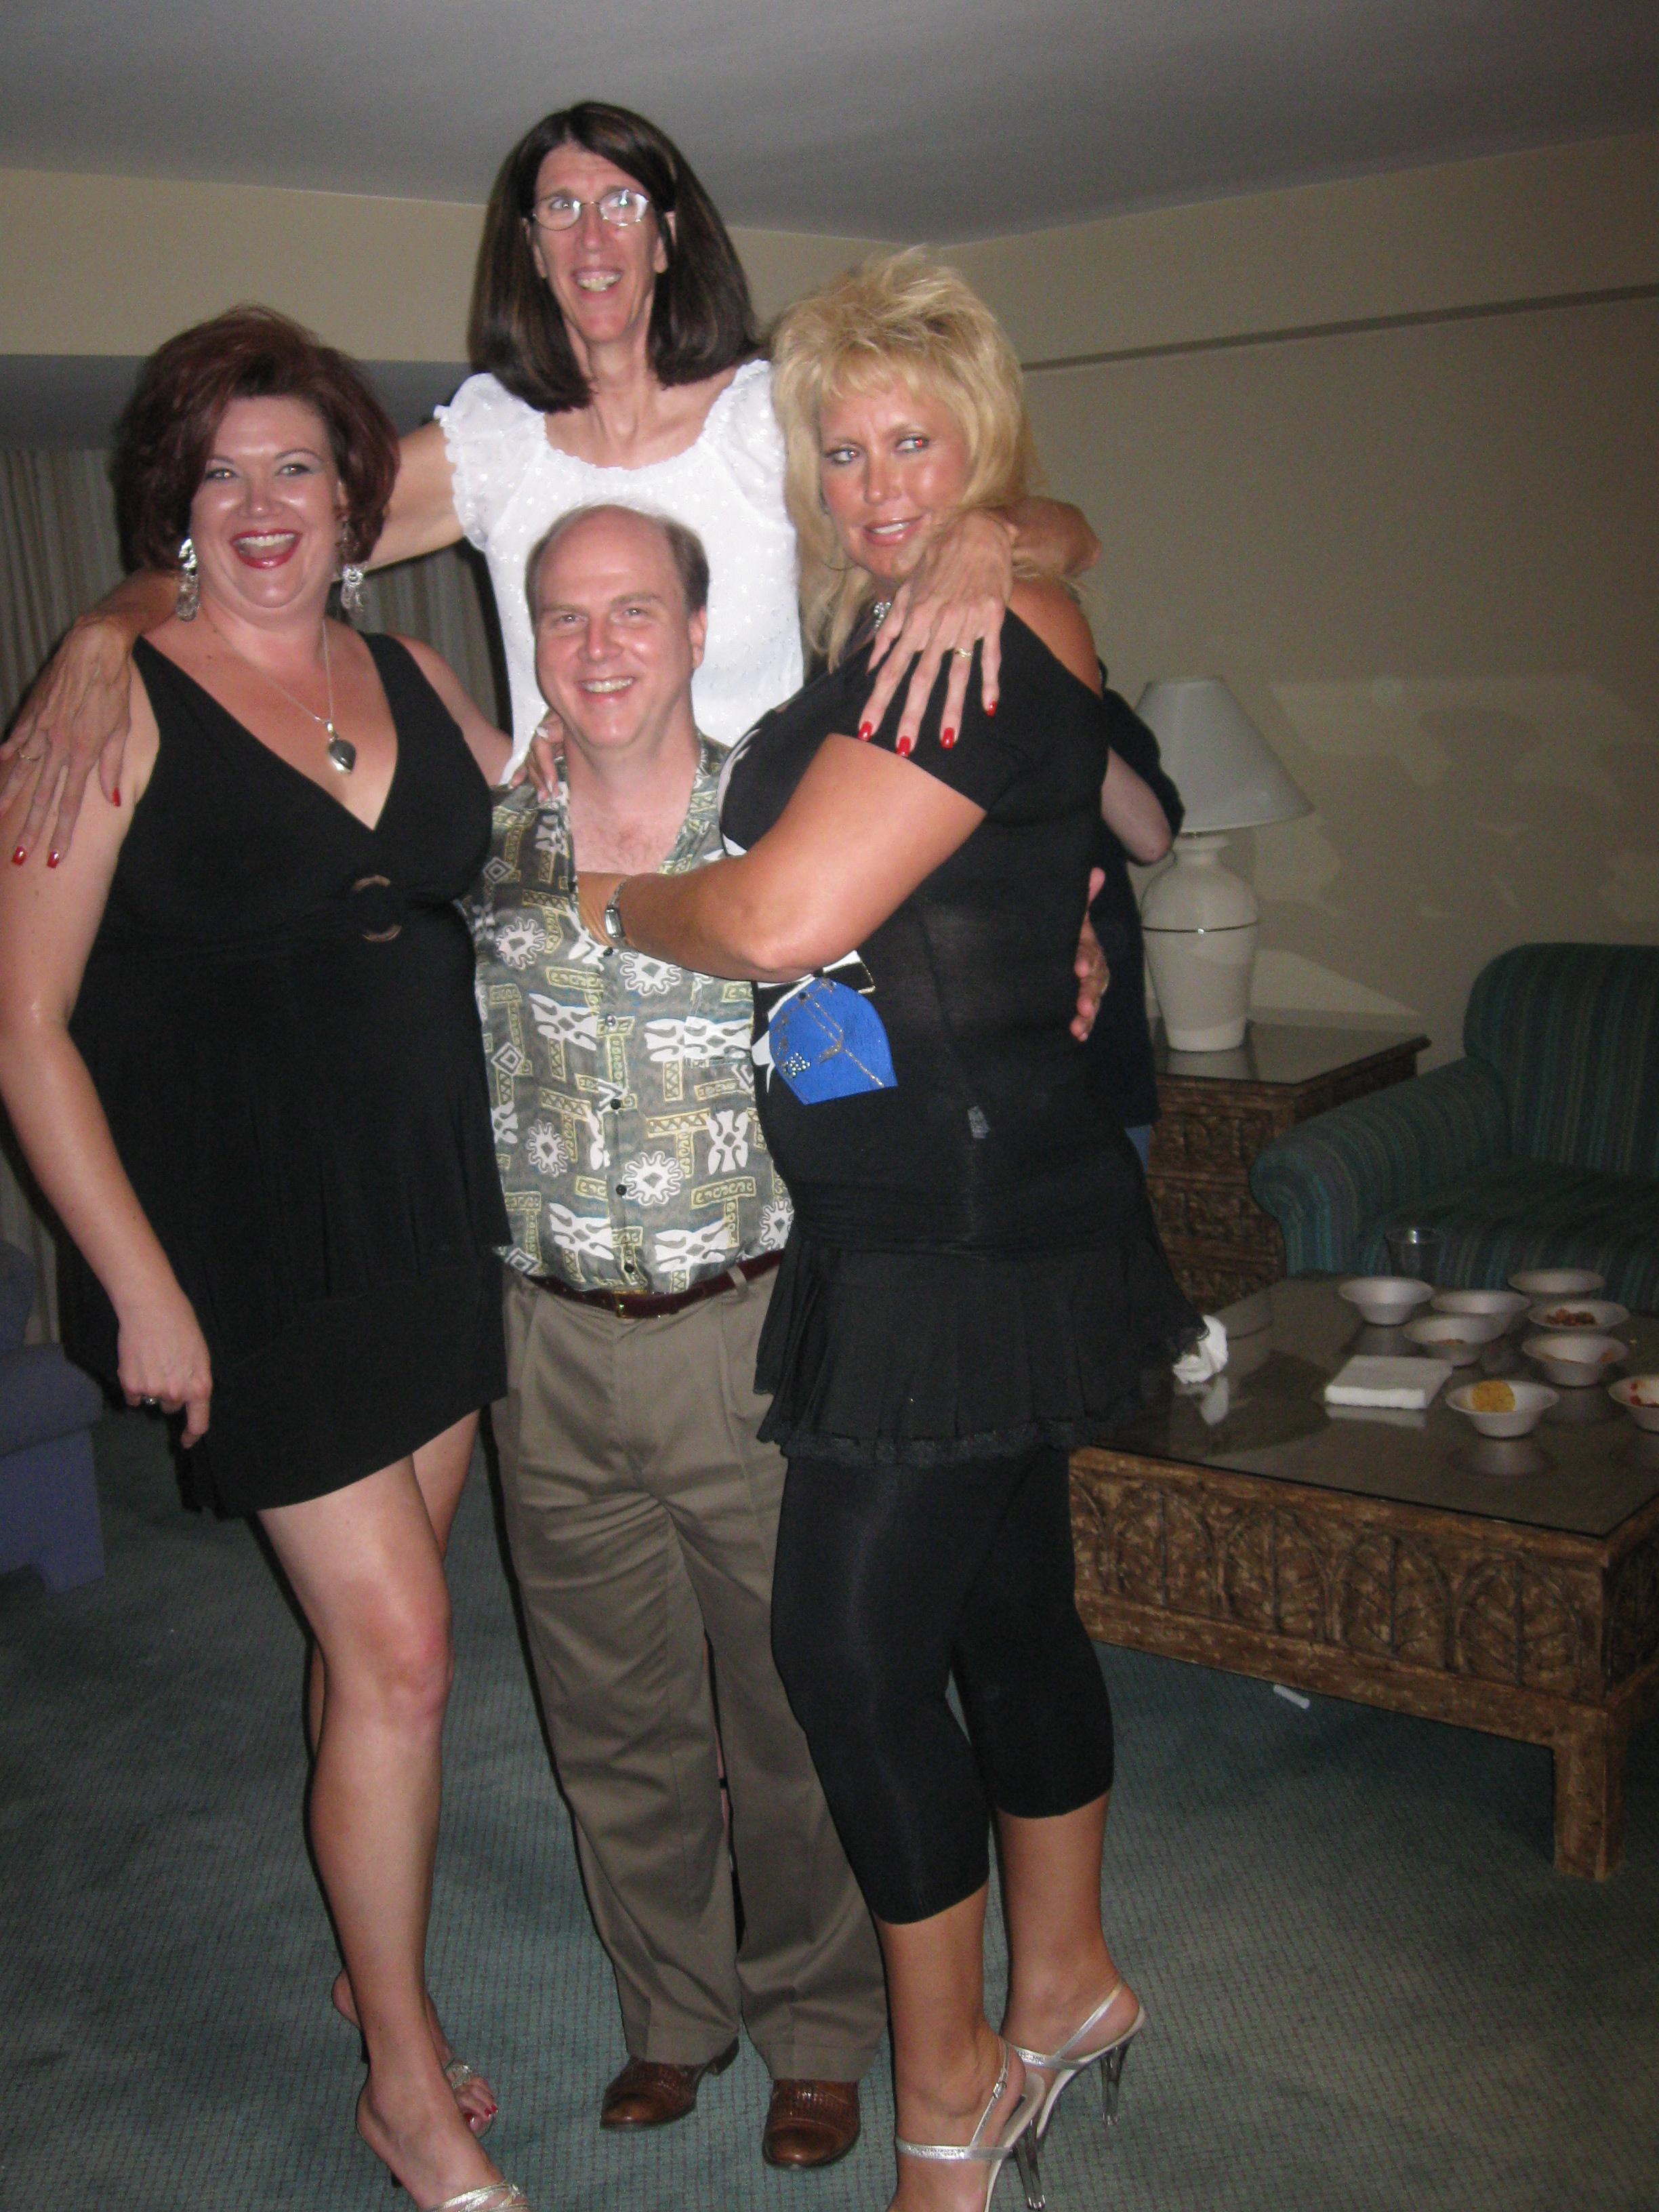 Naked amazon women-3015